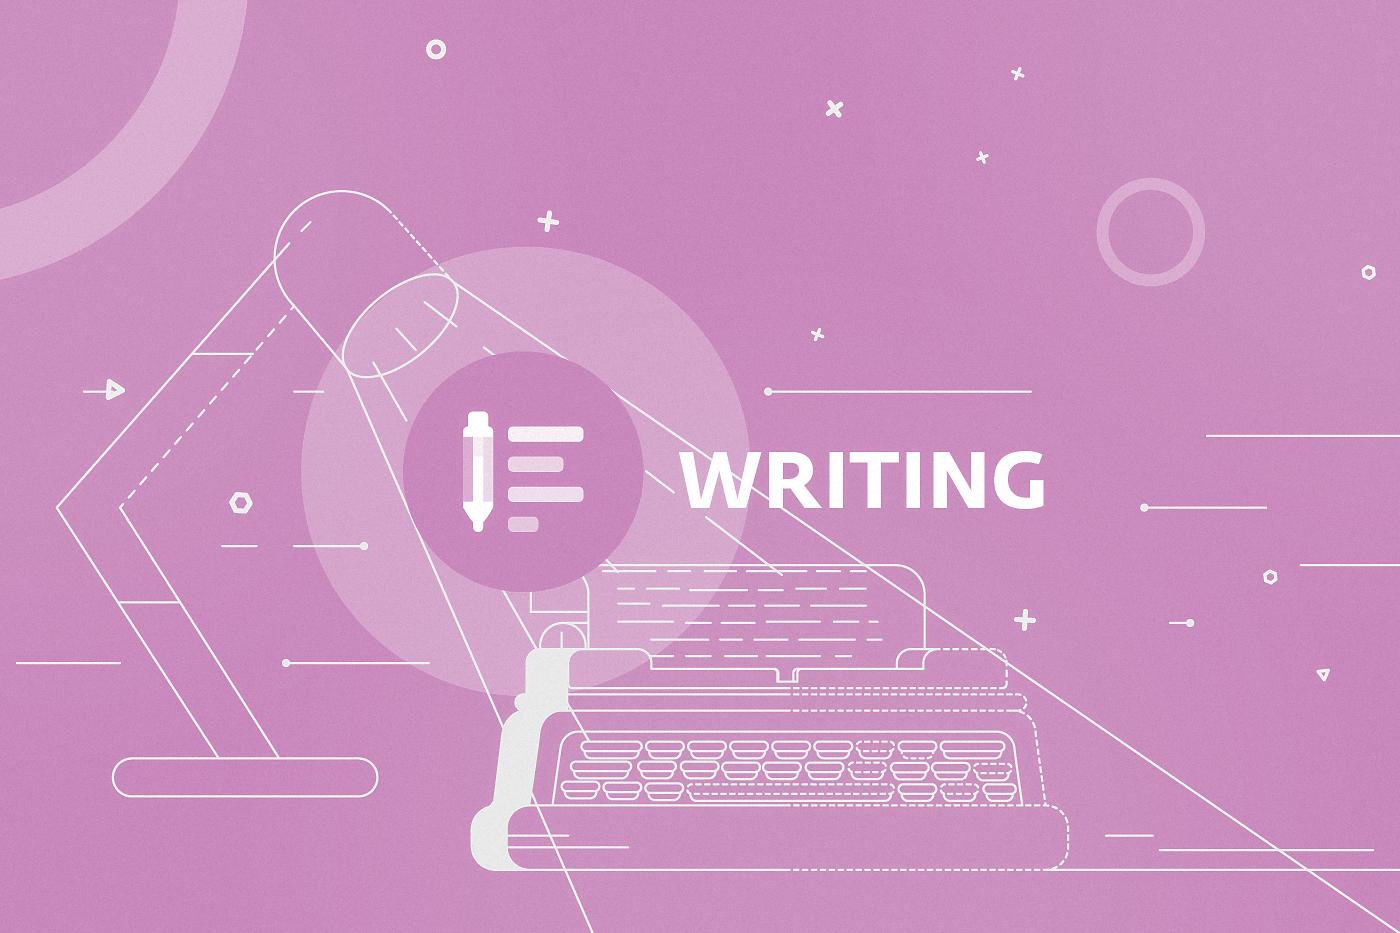 writing - Writing